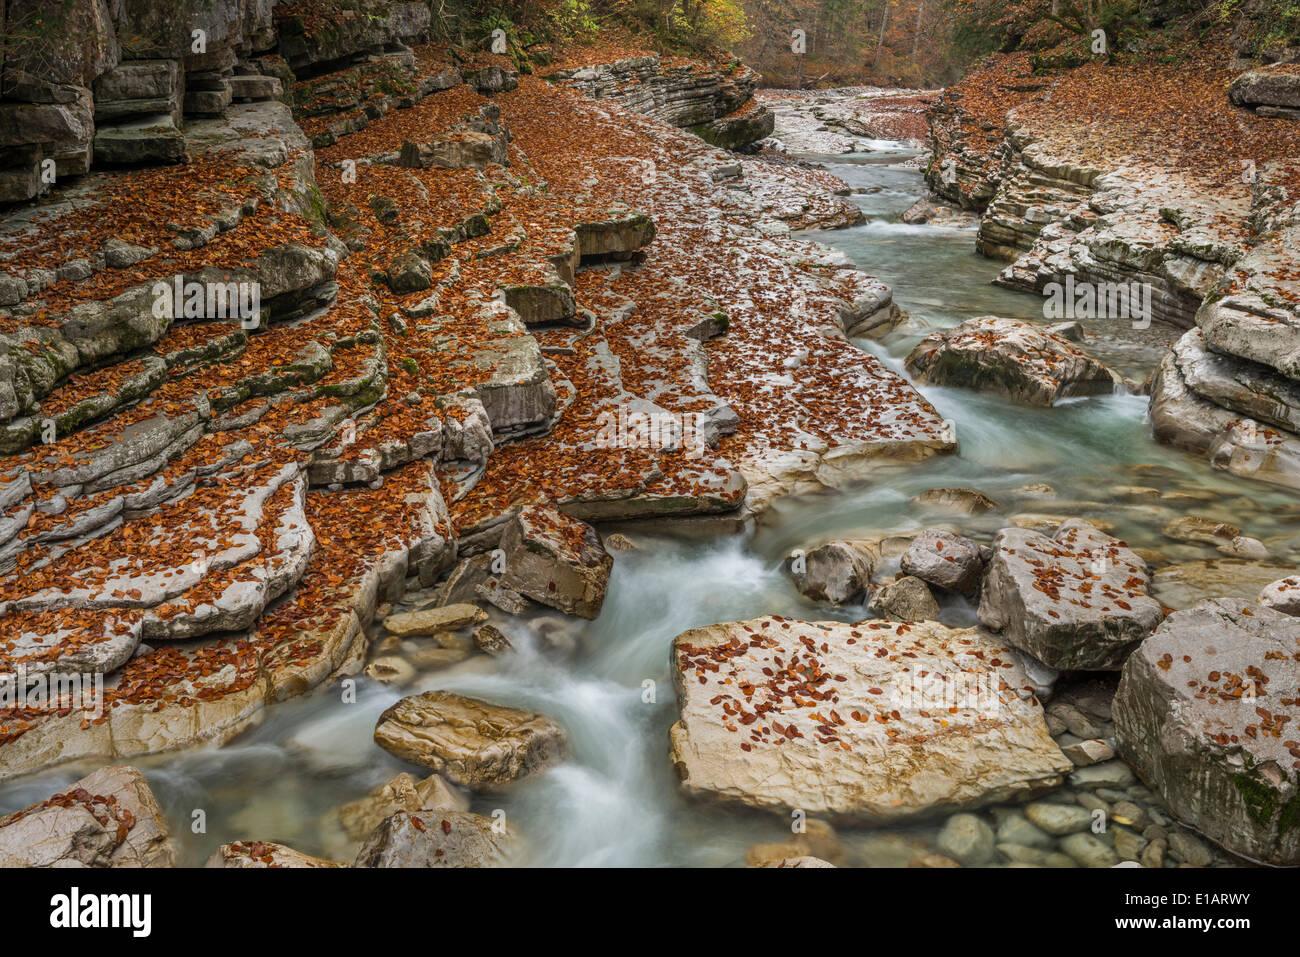 Taugl or Tauglbach, Tauglgries nature reserve, Hallein District, Salzburg, Austria Stock Photo